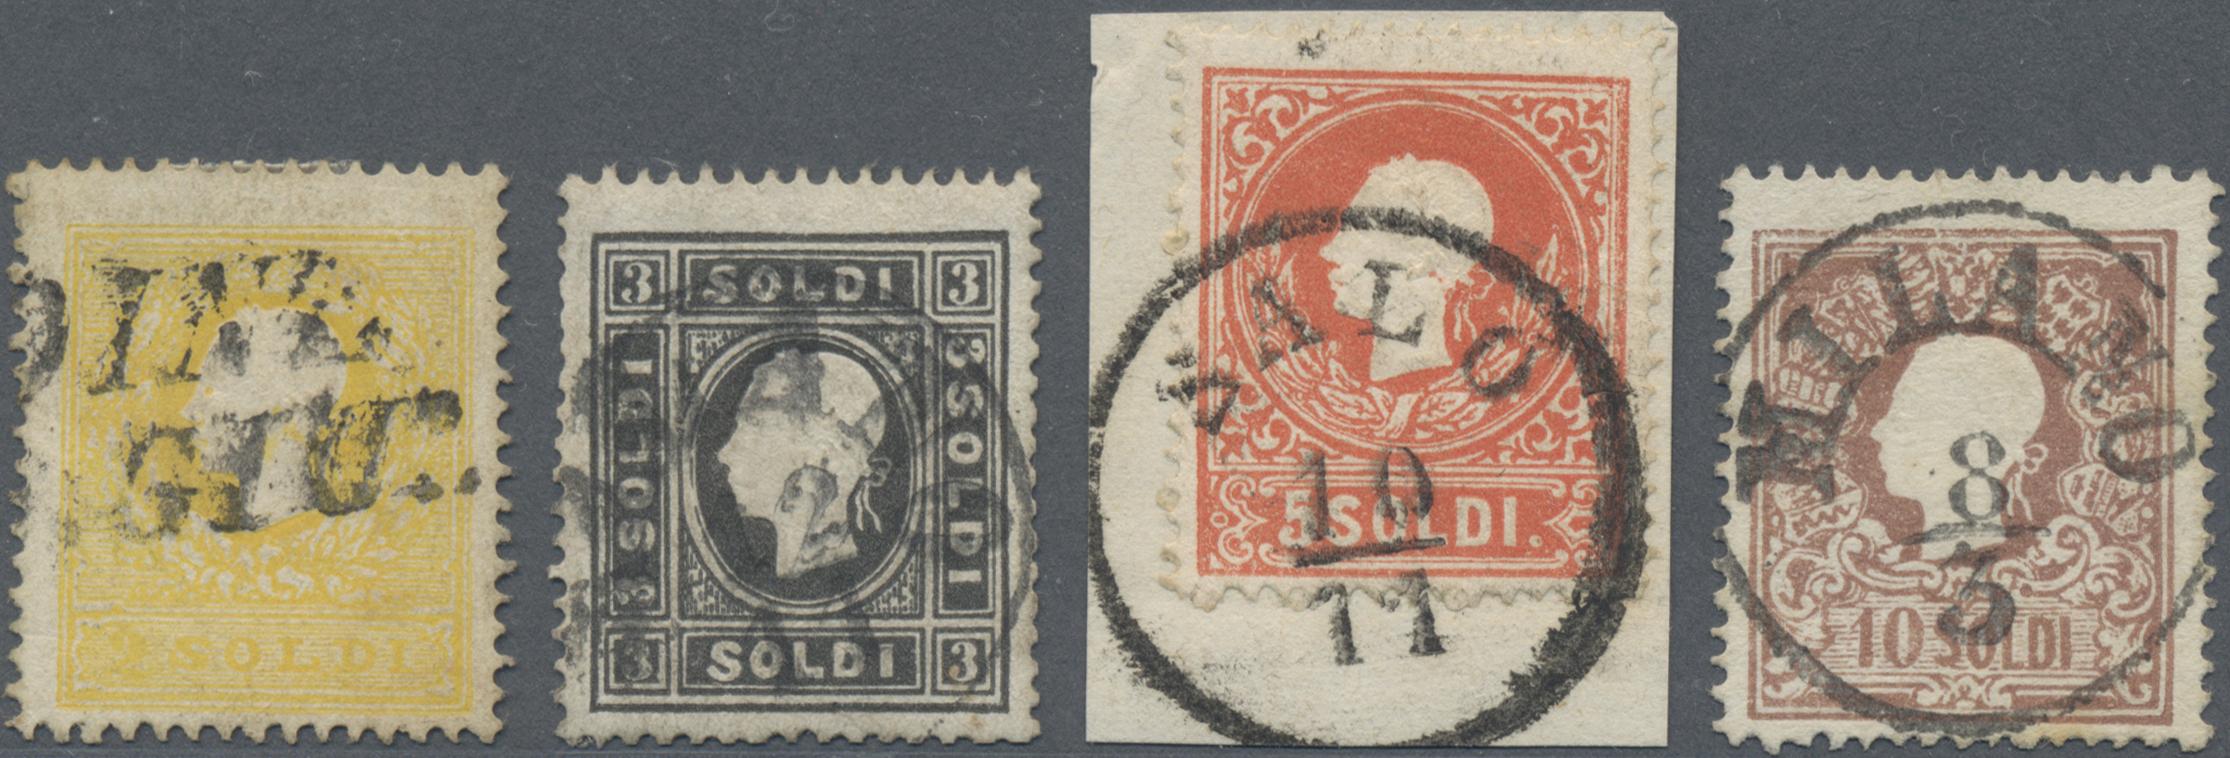 Lot 35016 - Österreich - Lombardei und Venetien  -  Auktionshaus Christoph Gärtner GmbH & Co. KG Sale #44 Collections Germany